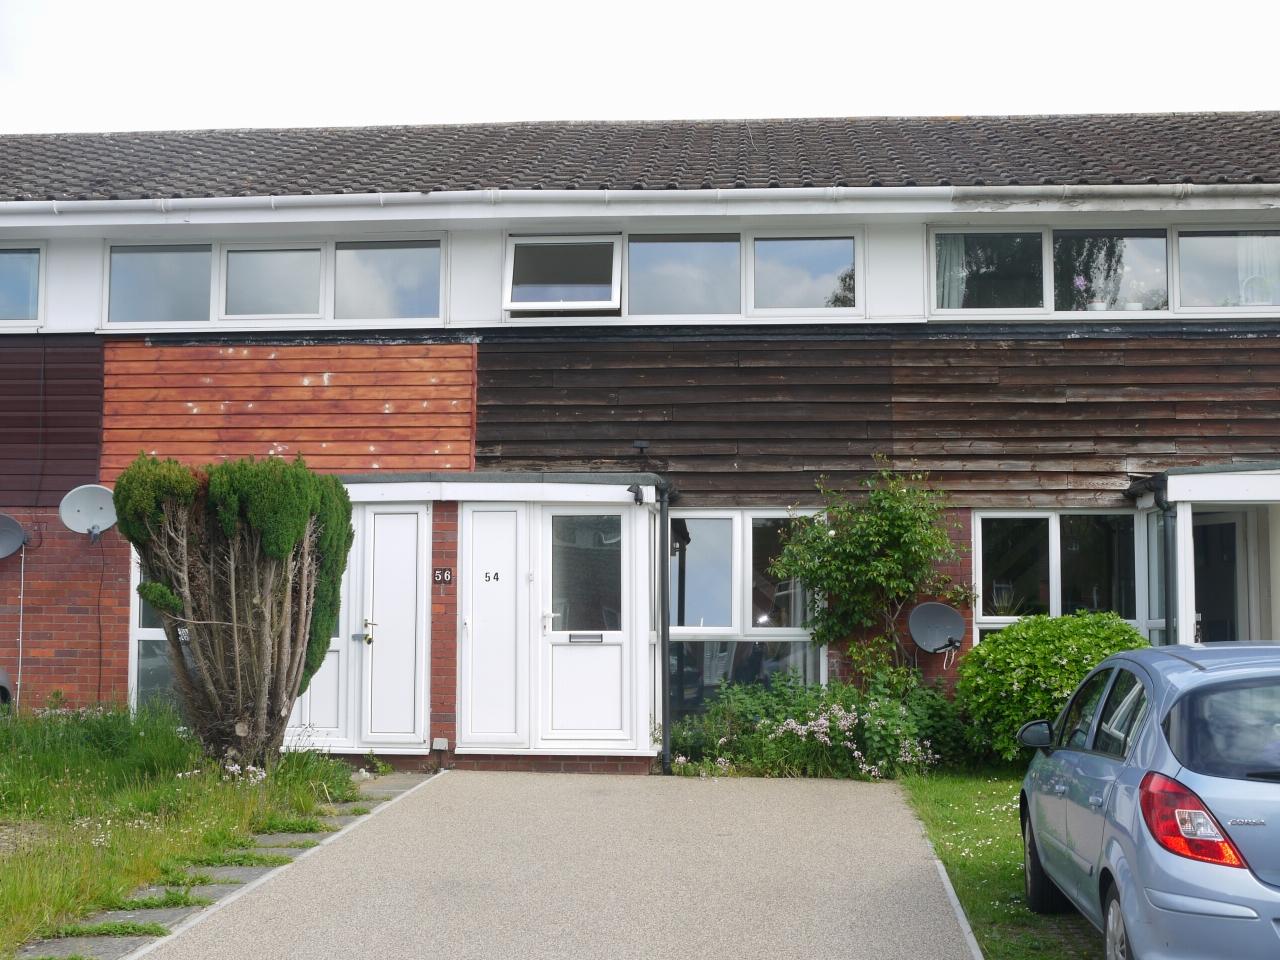 2 bedroom mid terraced house Let in Sevenoaks - Photograph 1